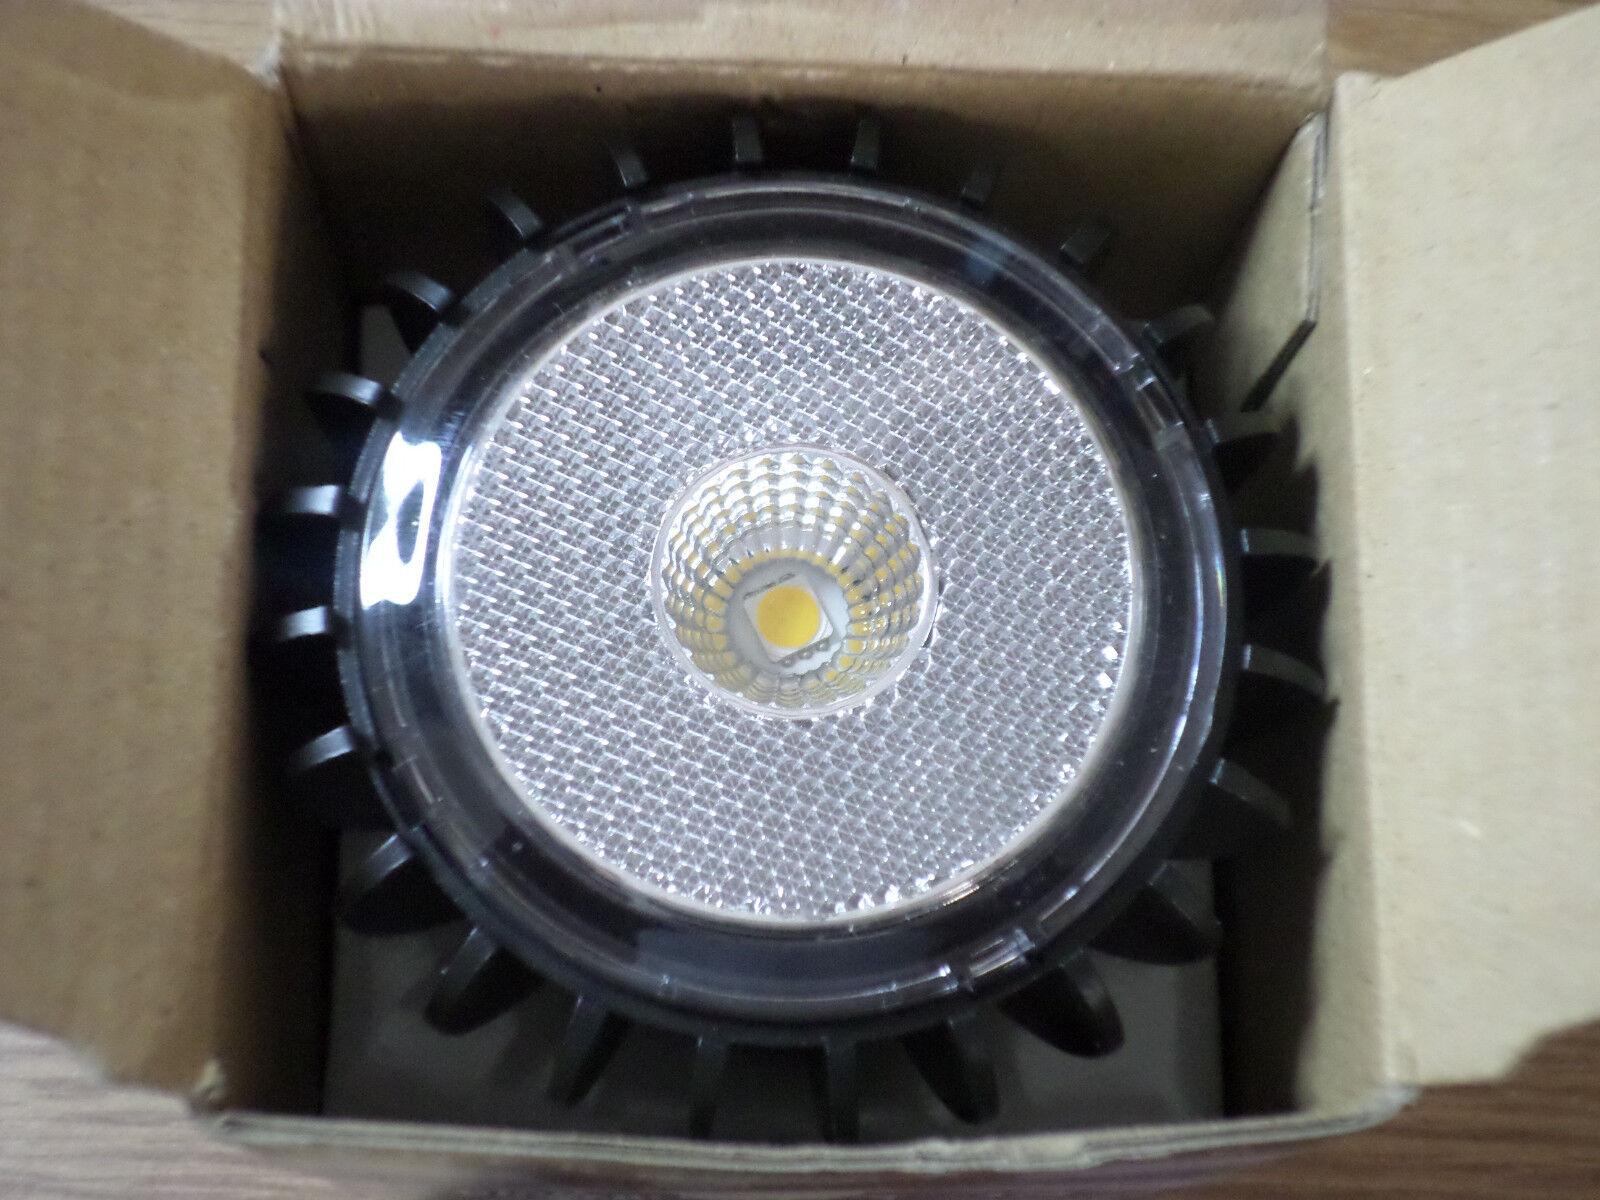 EICO LEDP//PAR30LN-SP-30K LED Spotlight Bulb 12W 120V 3000K Warm White